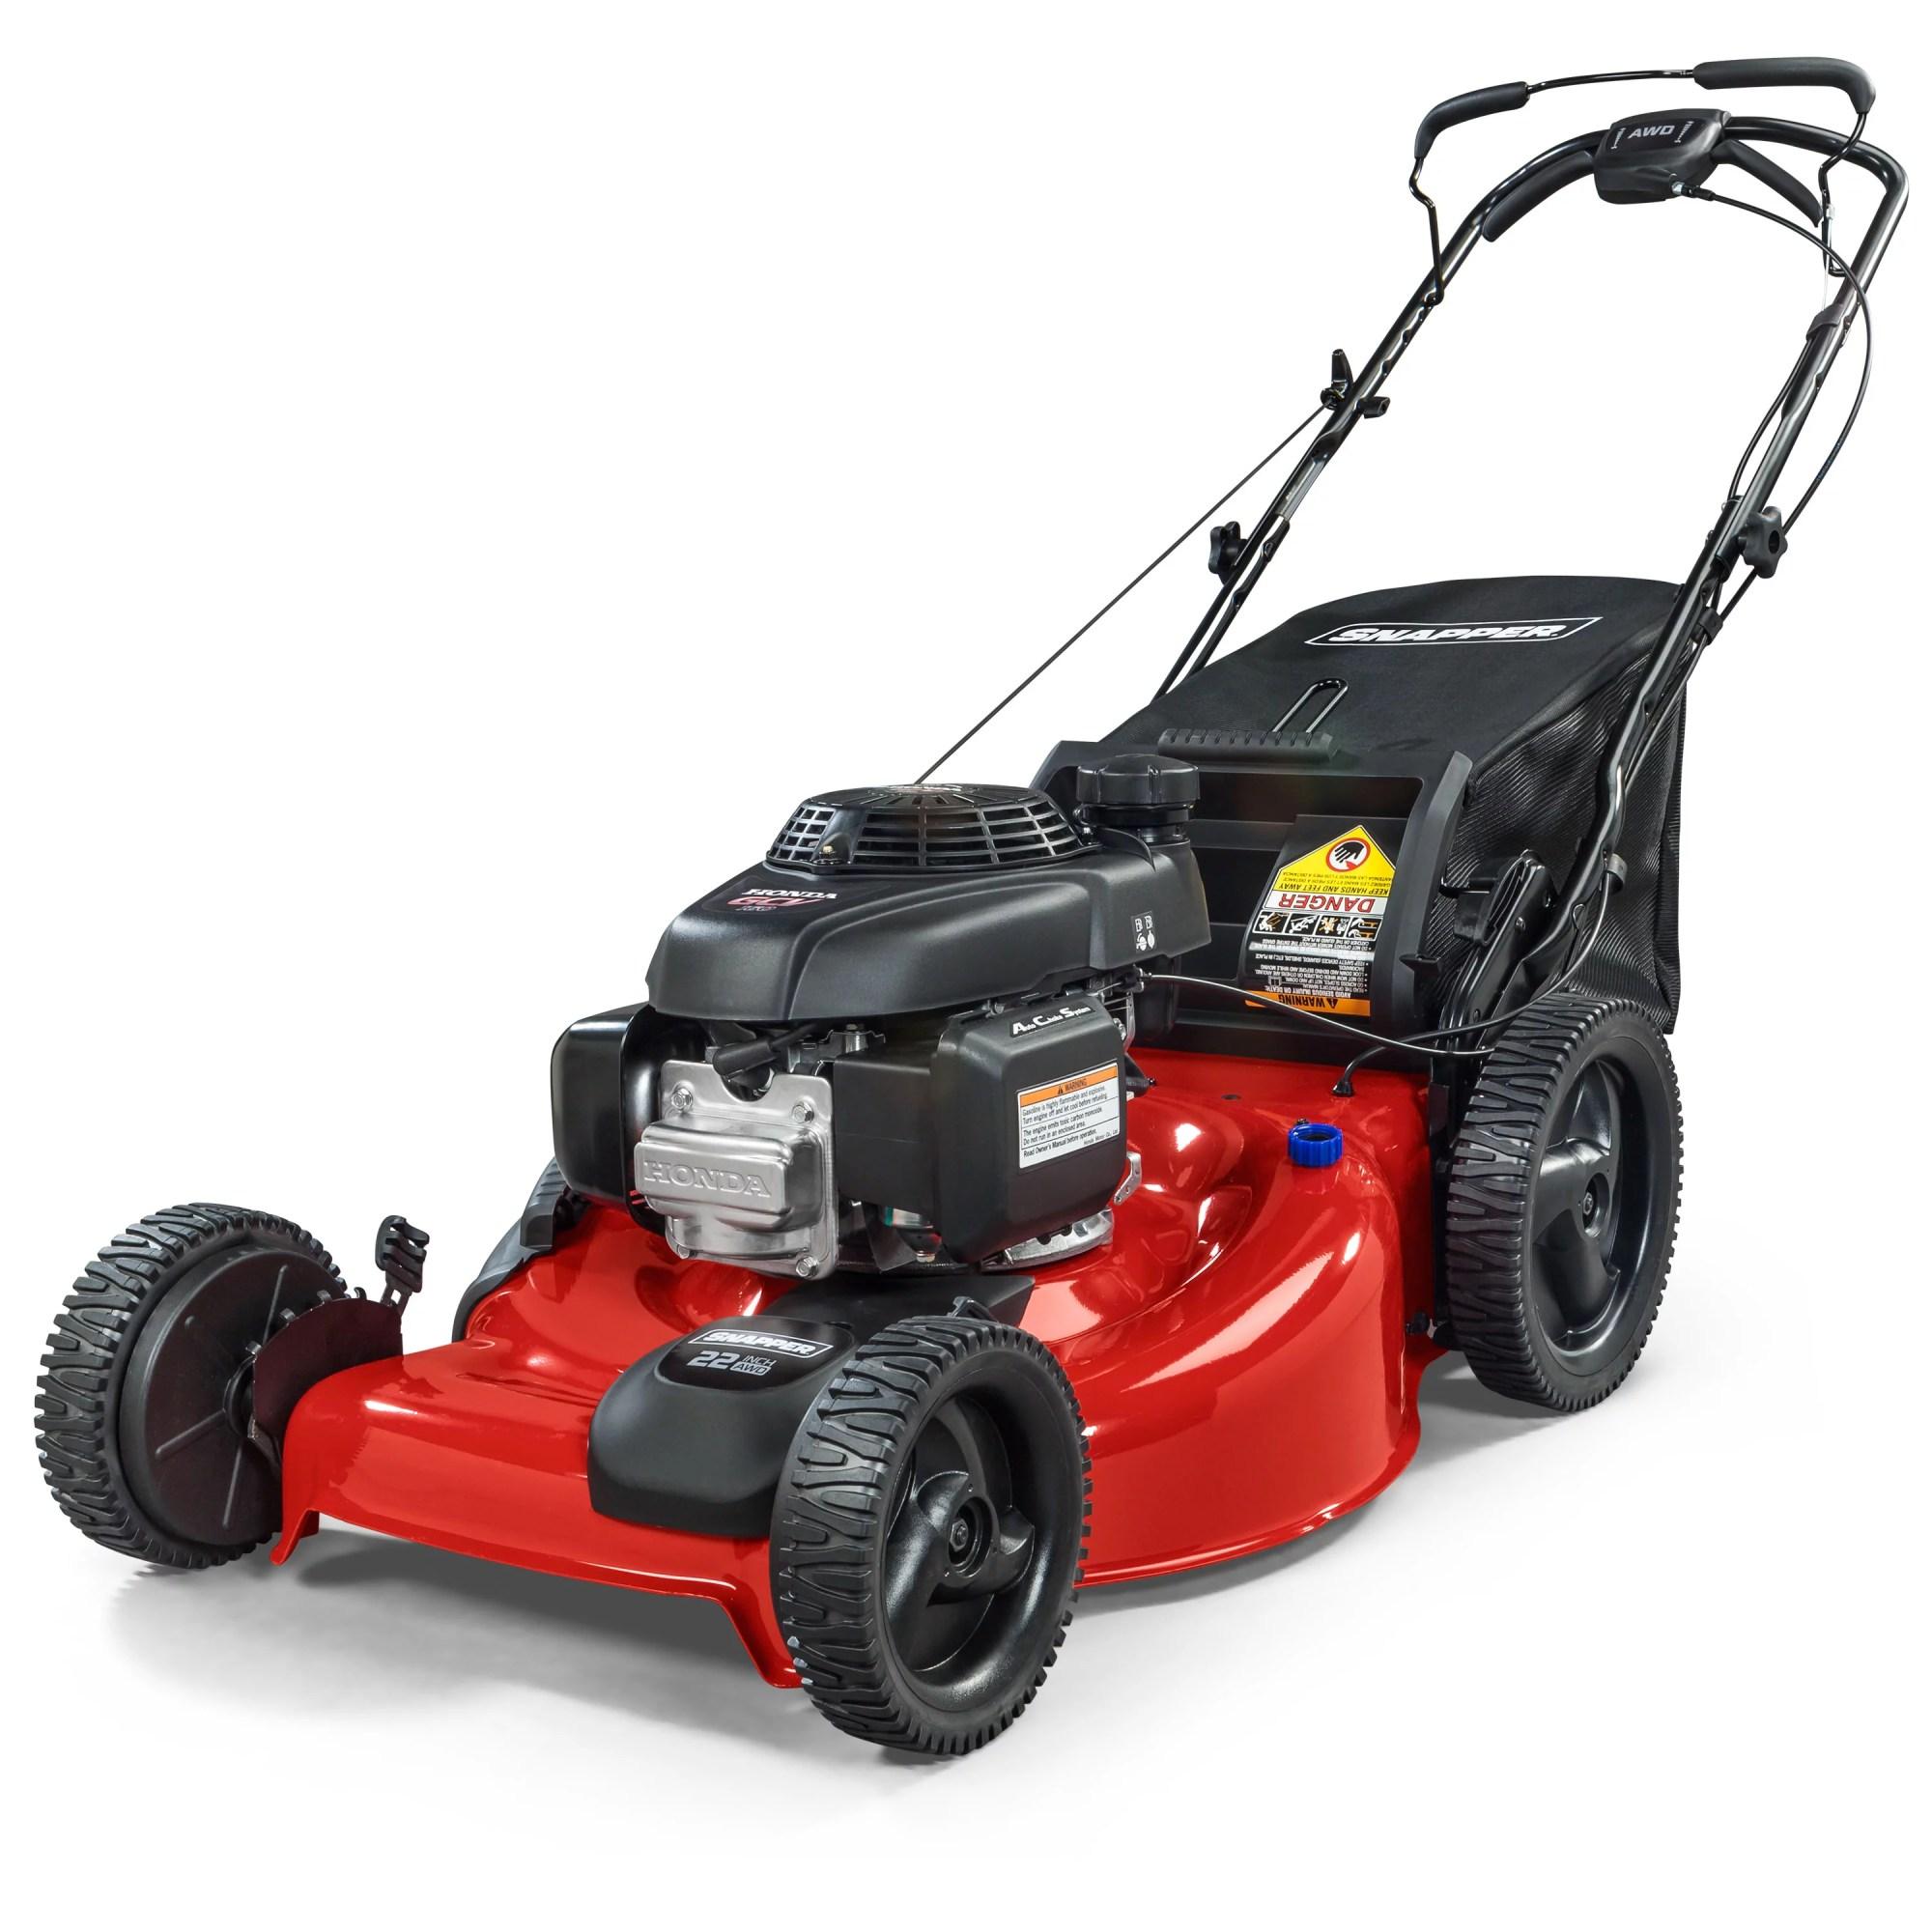 hight resolution of honda gcv 160cc all wheel drive lawnmower walmart com